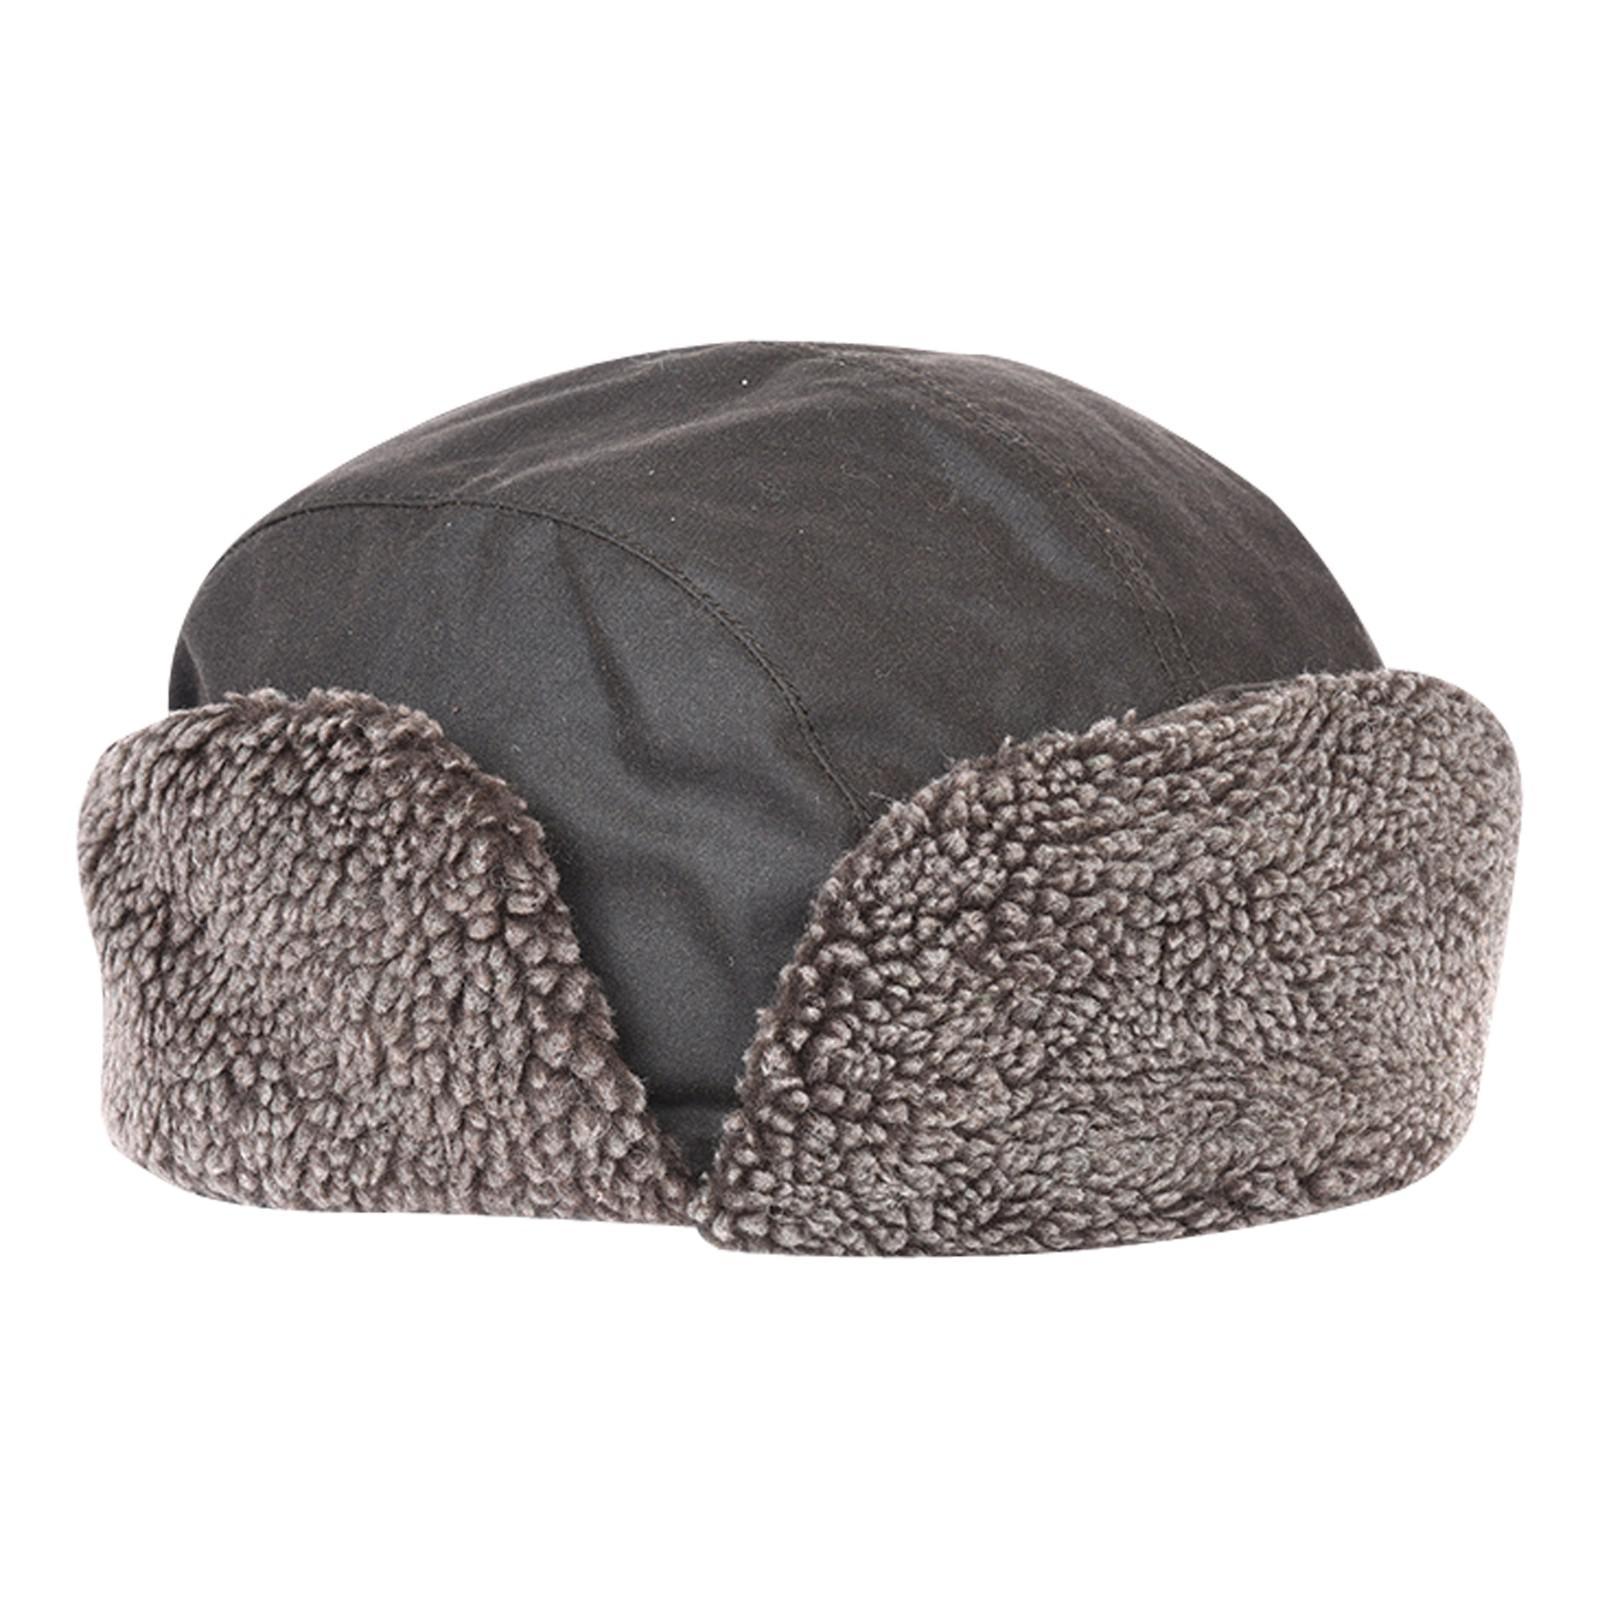 24706d1f7 Barbour Gray Wax Harton Trapper Hat for men